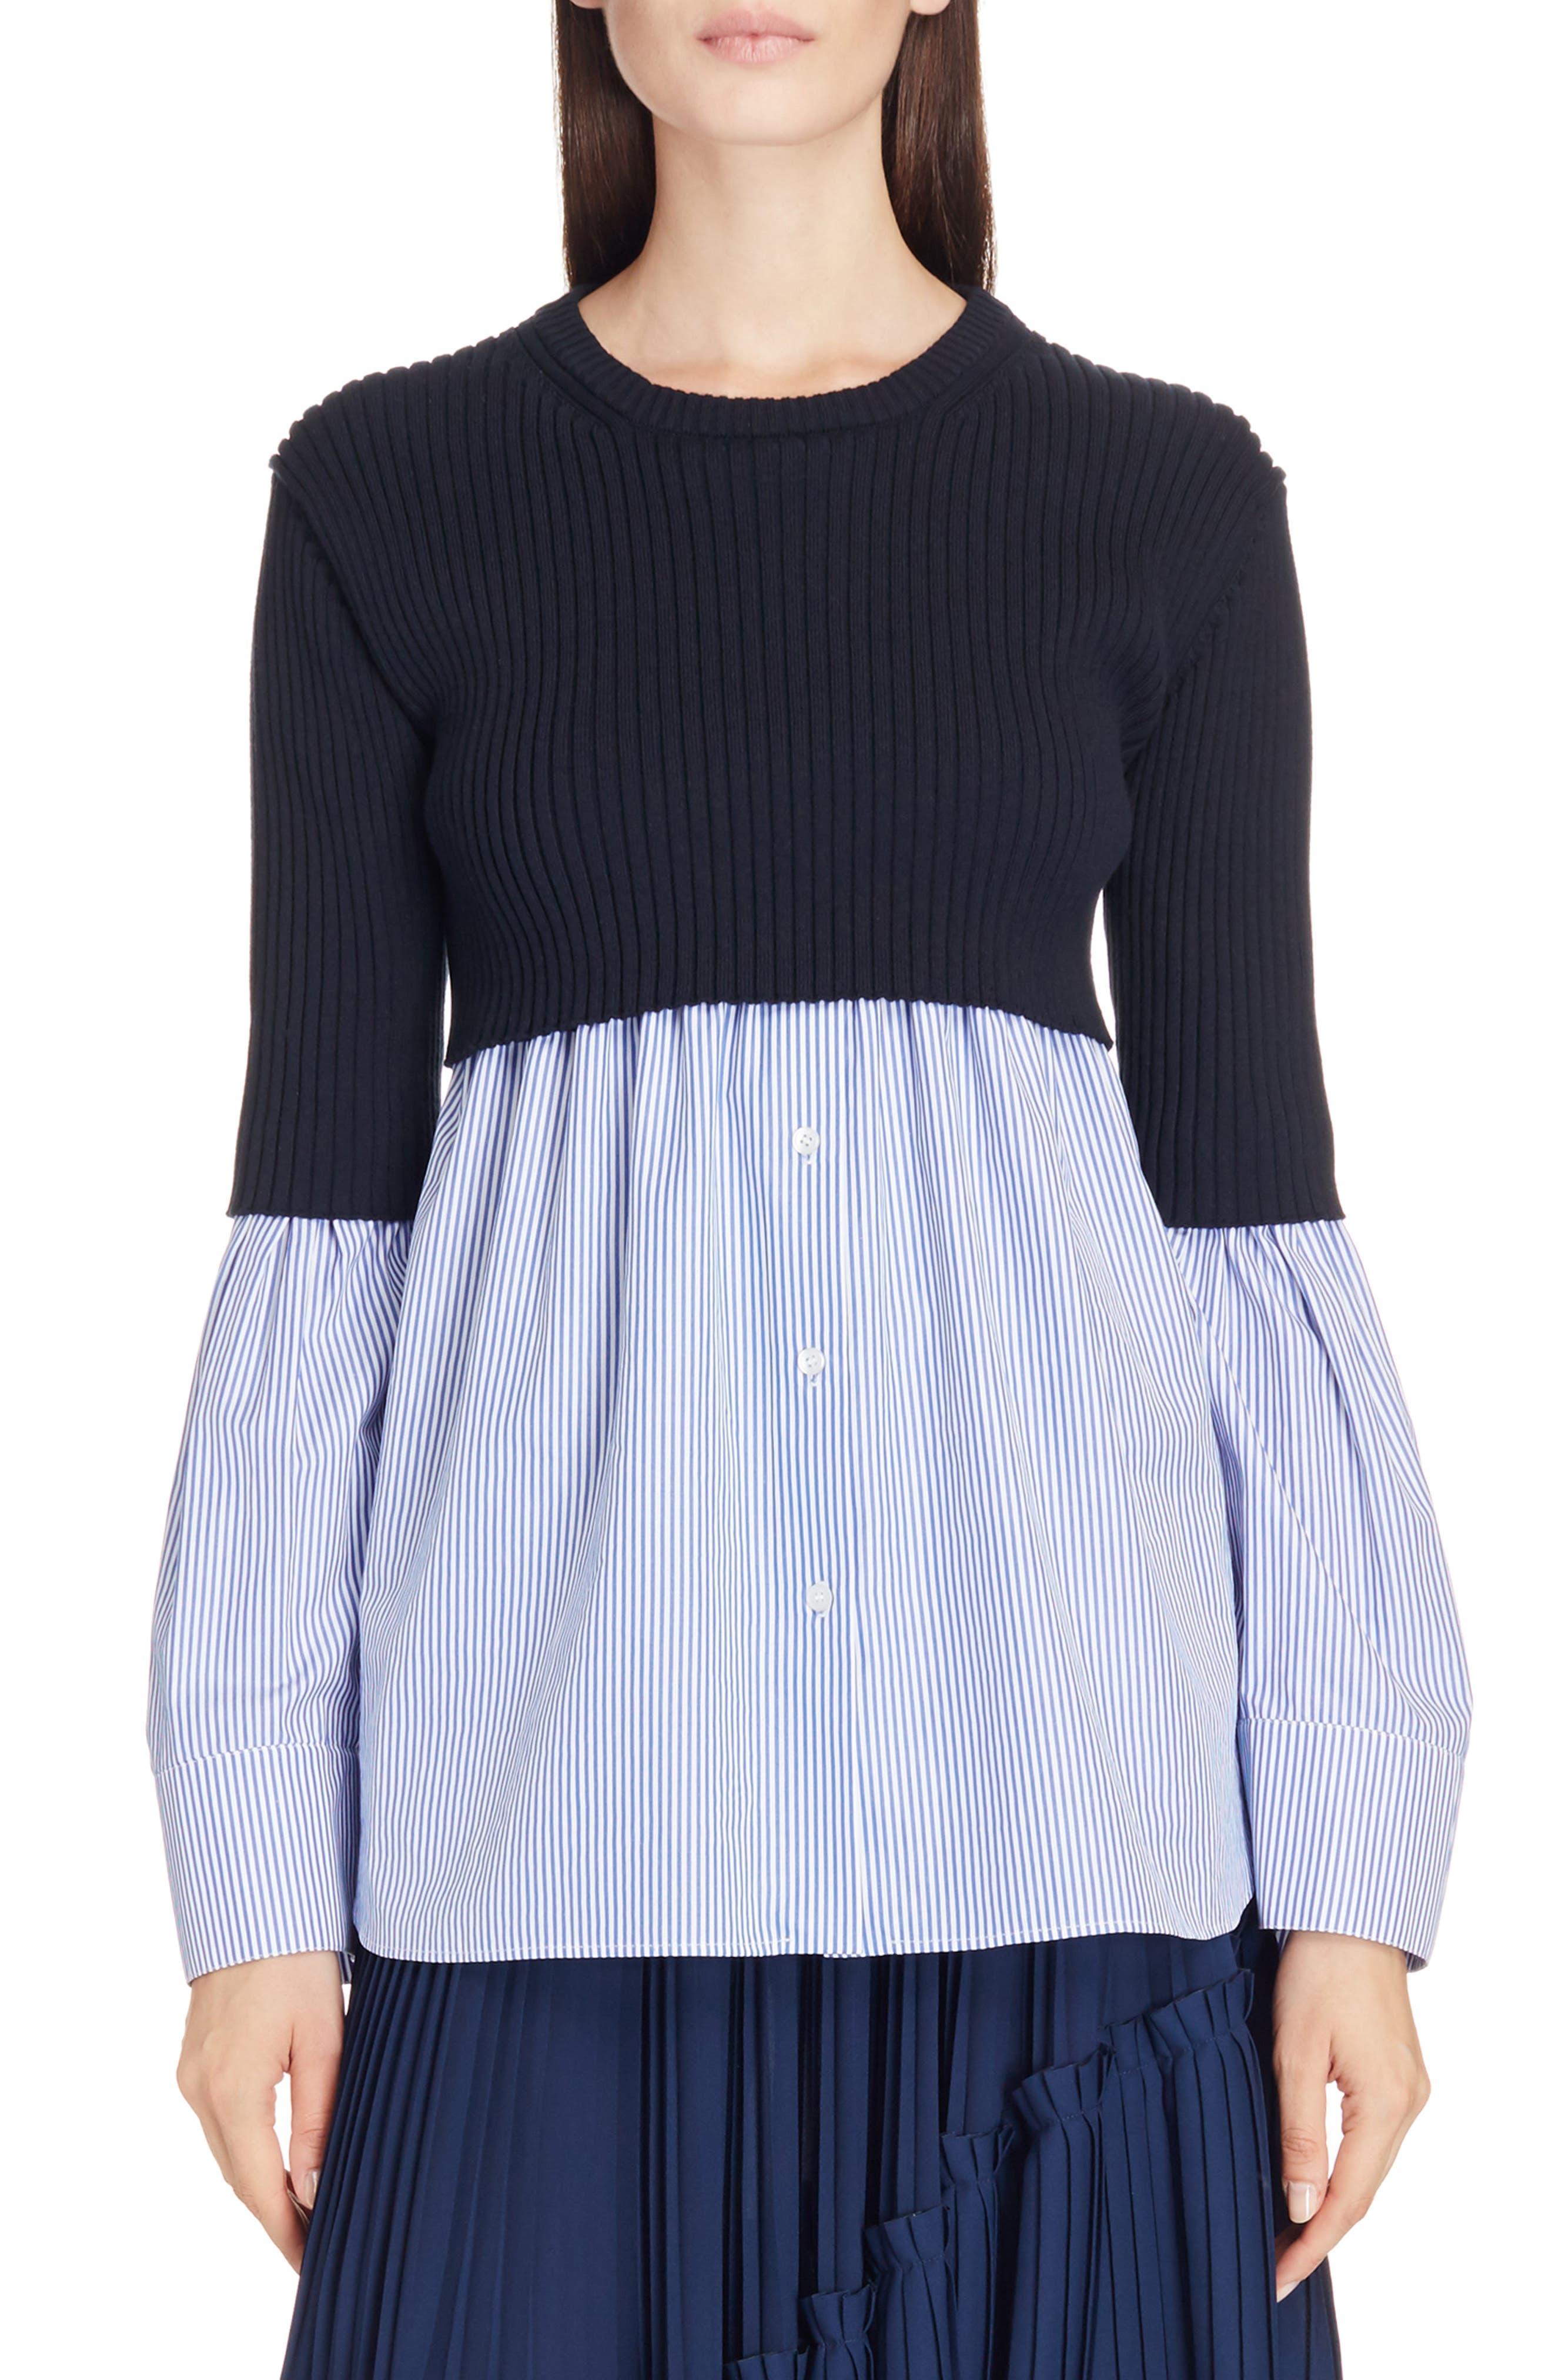 Main Image - KENZO Knit Overlay Cotton Blouse